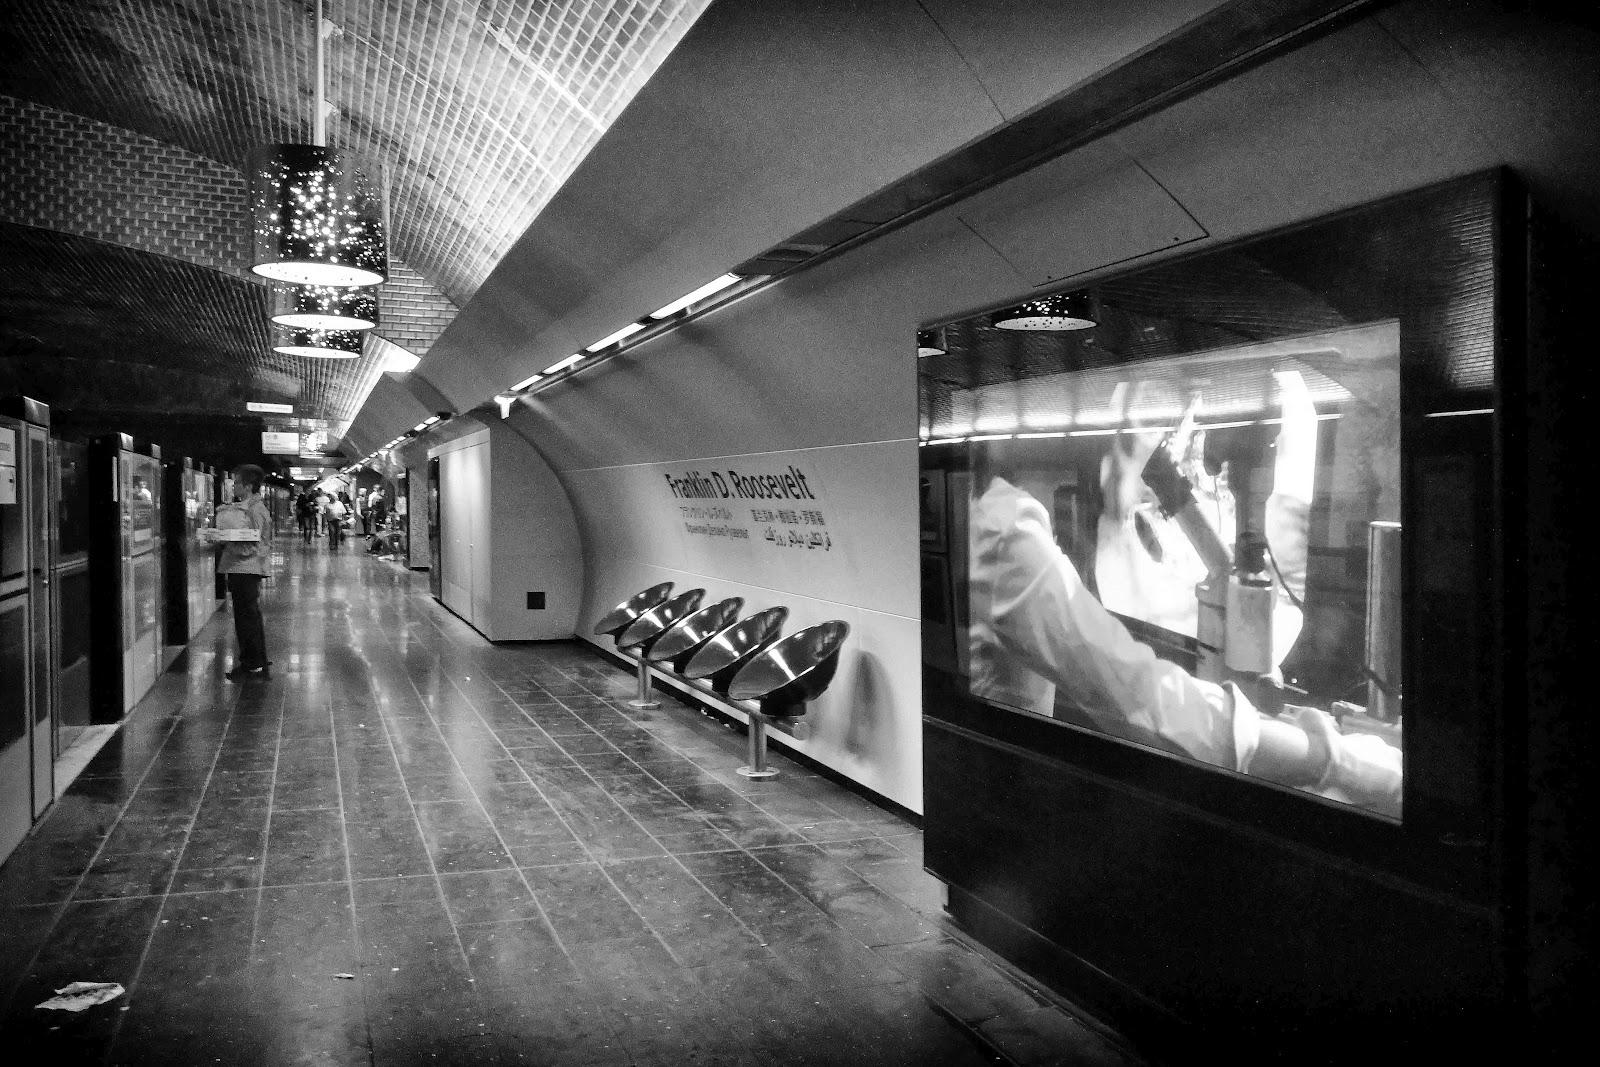 Paris fvdv de metro van abbesses tot wagram